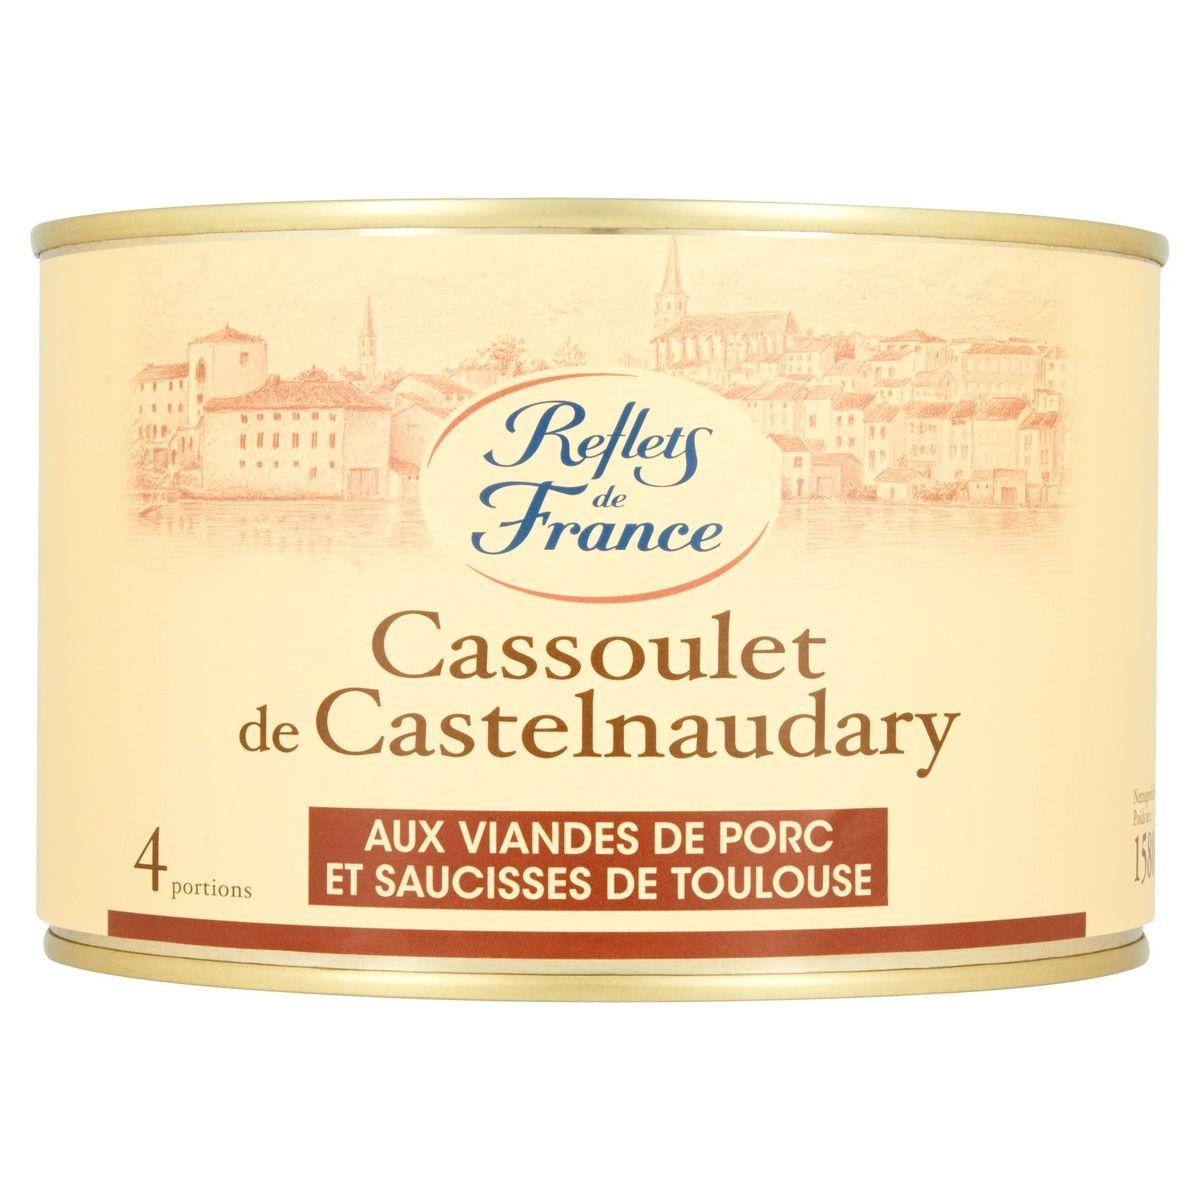 Reflets de France Cassoulet de Castelnaudary 1580 g